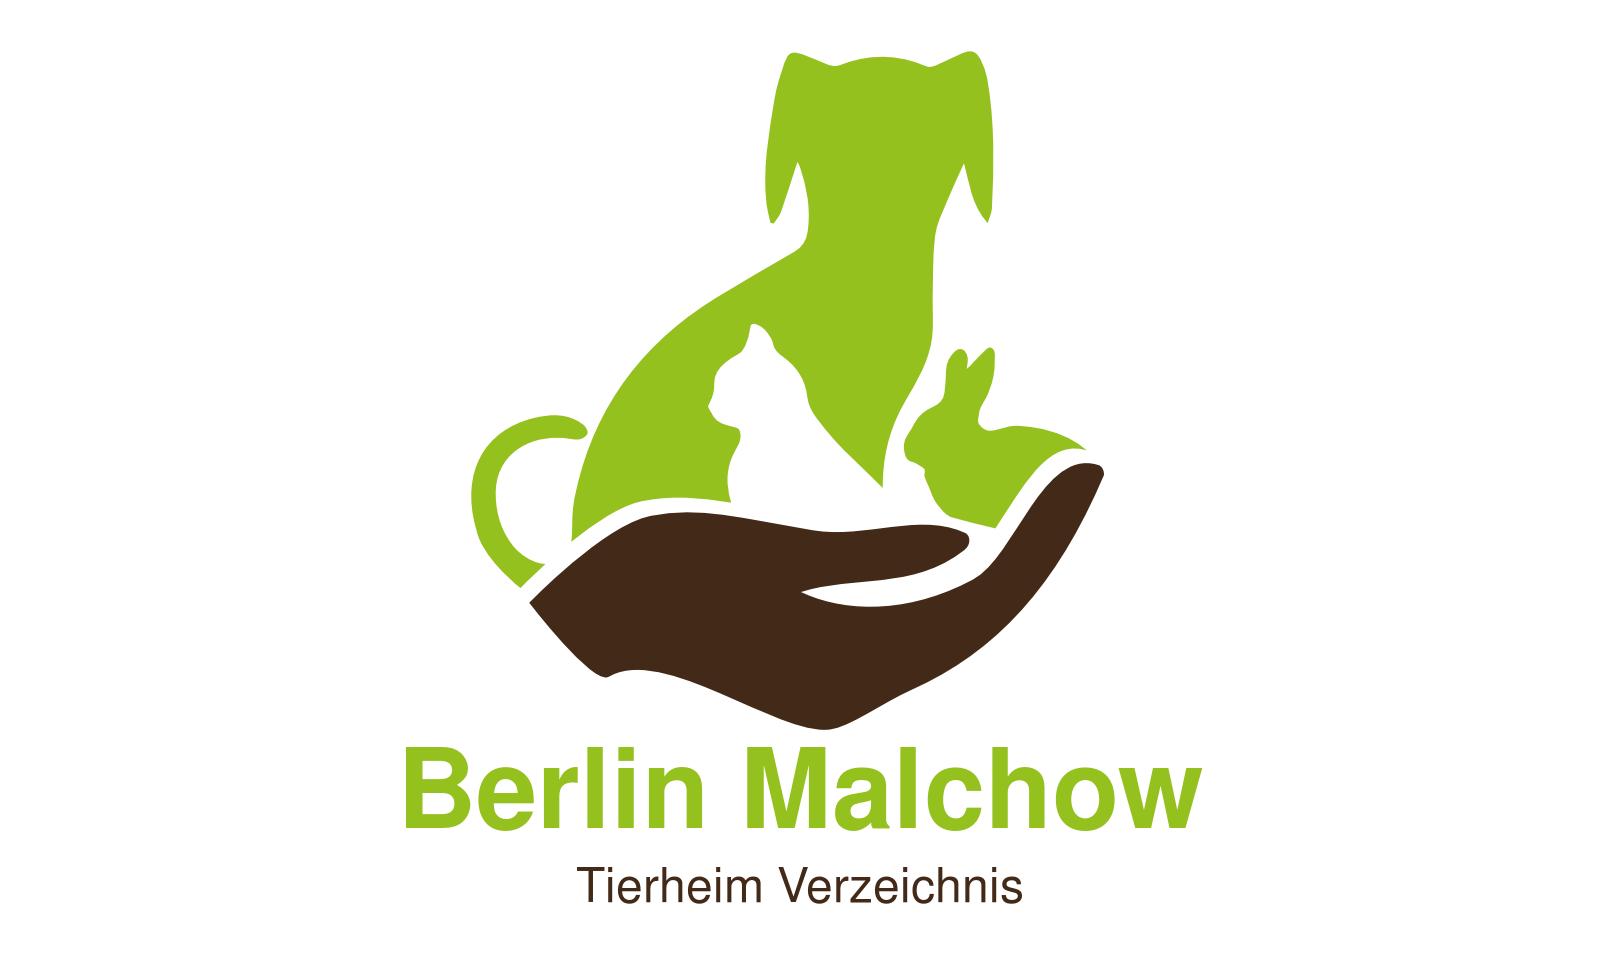 Tierheim Berlin Malchow